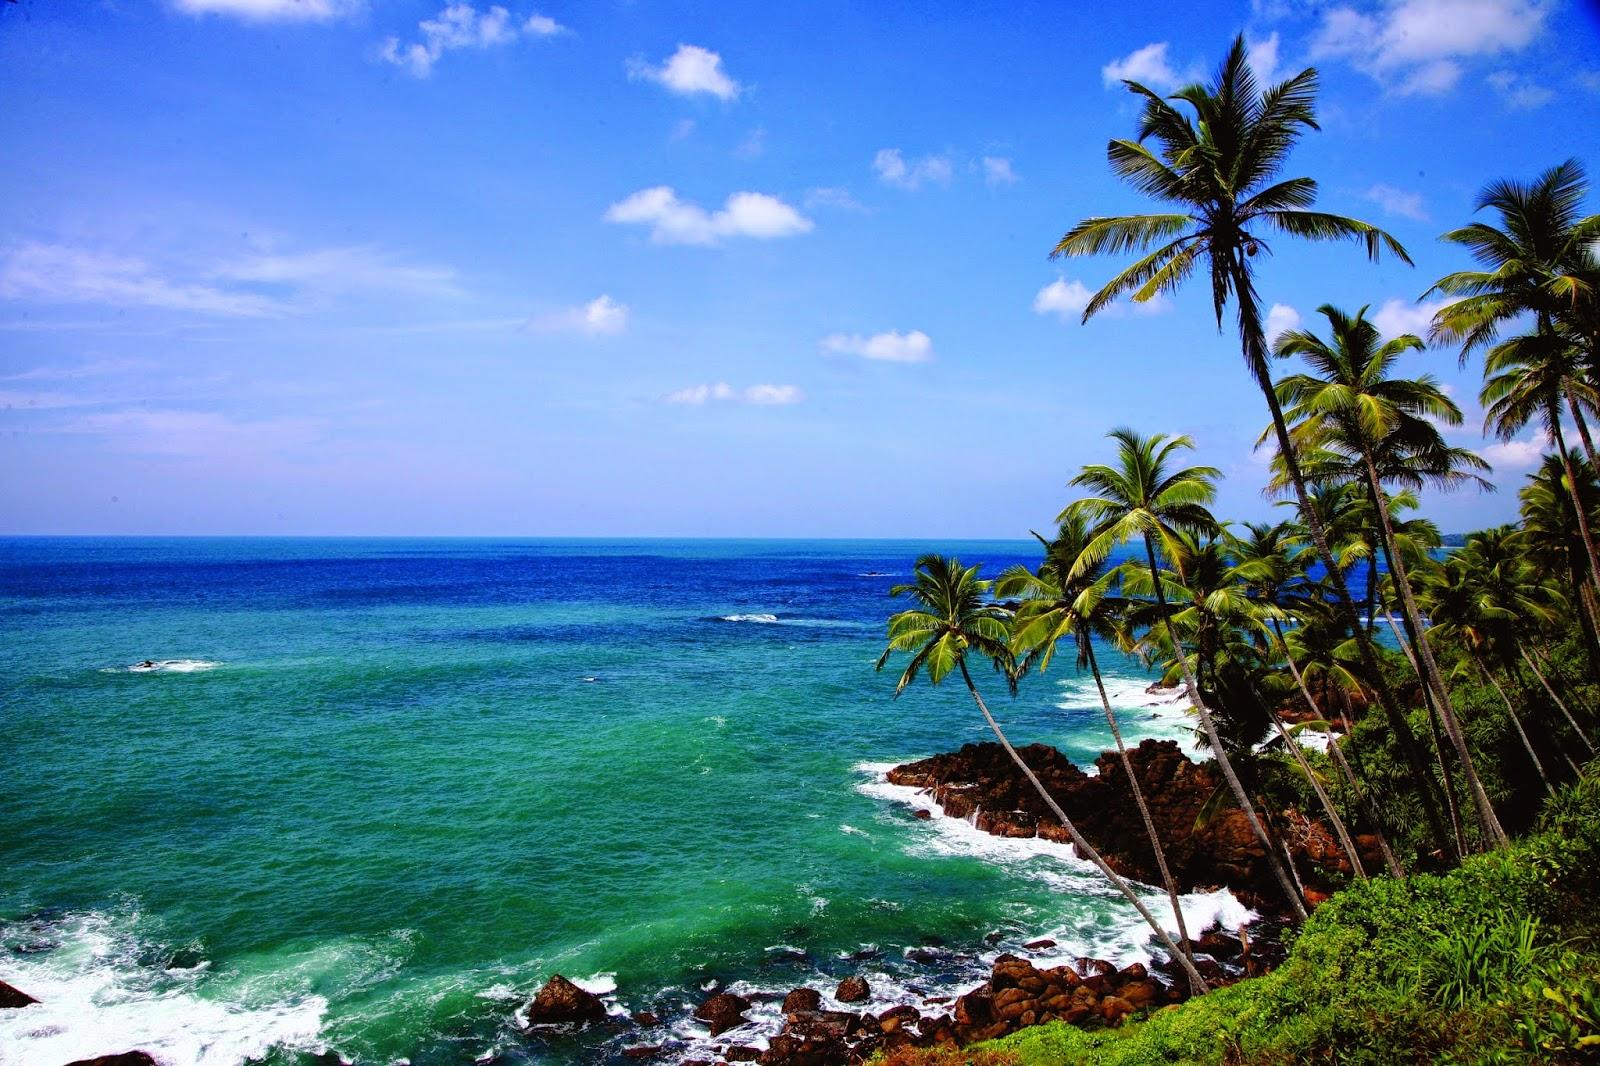 Sri Lanka: Photo Gallery Sri lanka tourism pictures